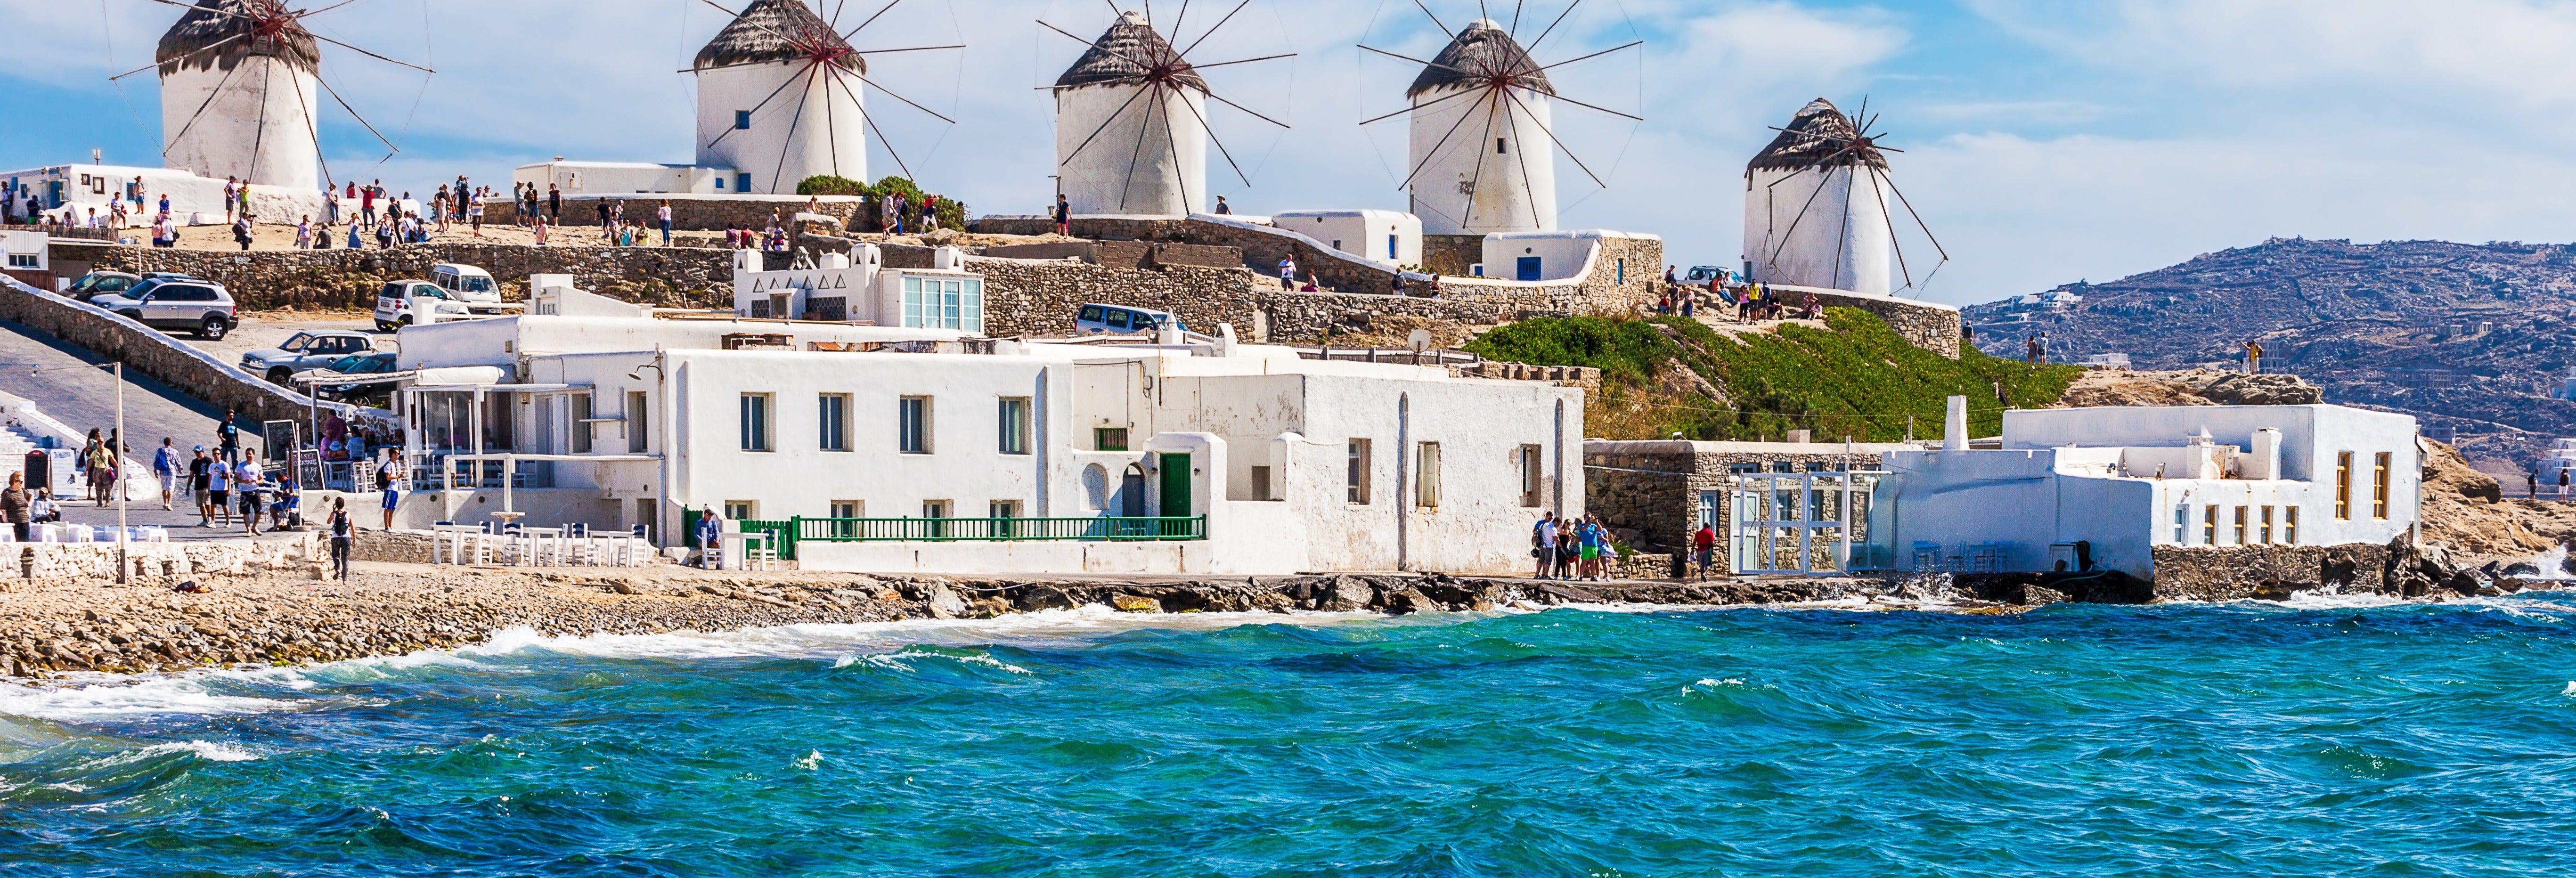 Mykonos and Santorini: 4 Days